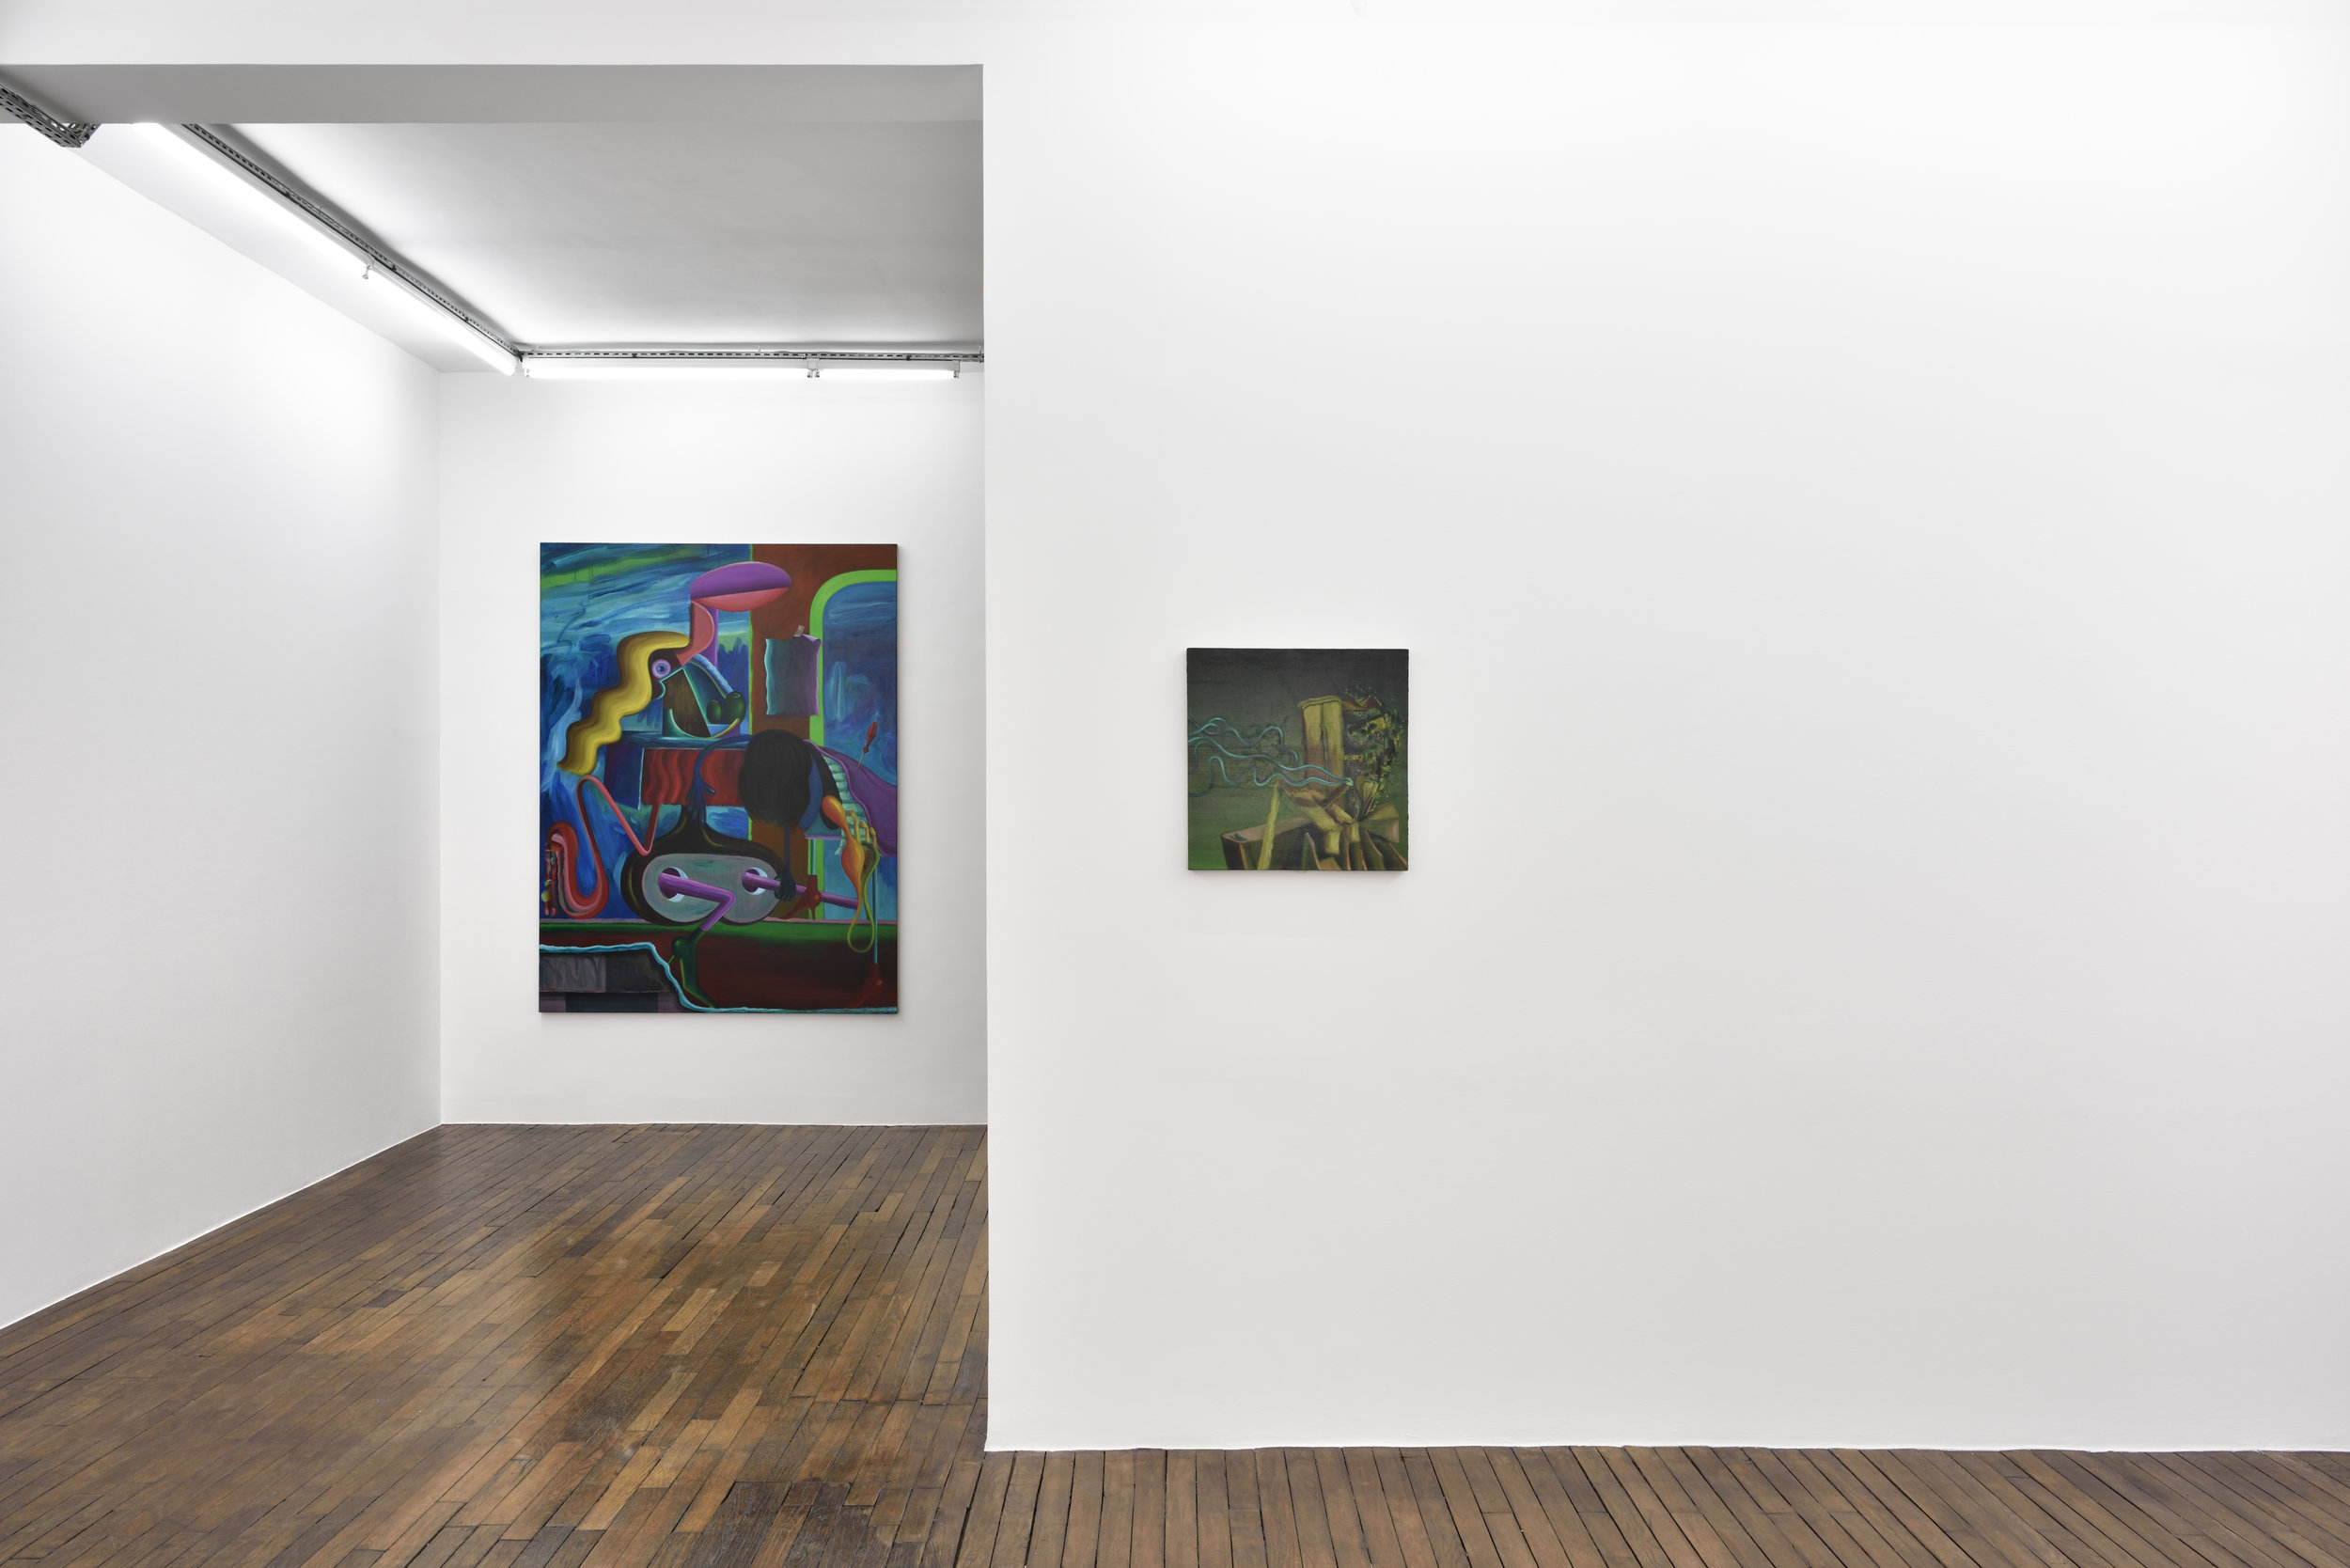 Installation View  I Would Prefer Not To.  2019  Galerie Thomas Bernard. Paris